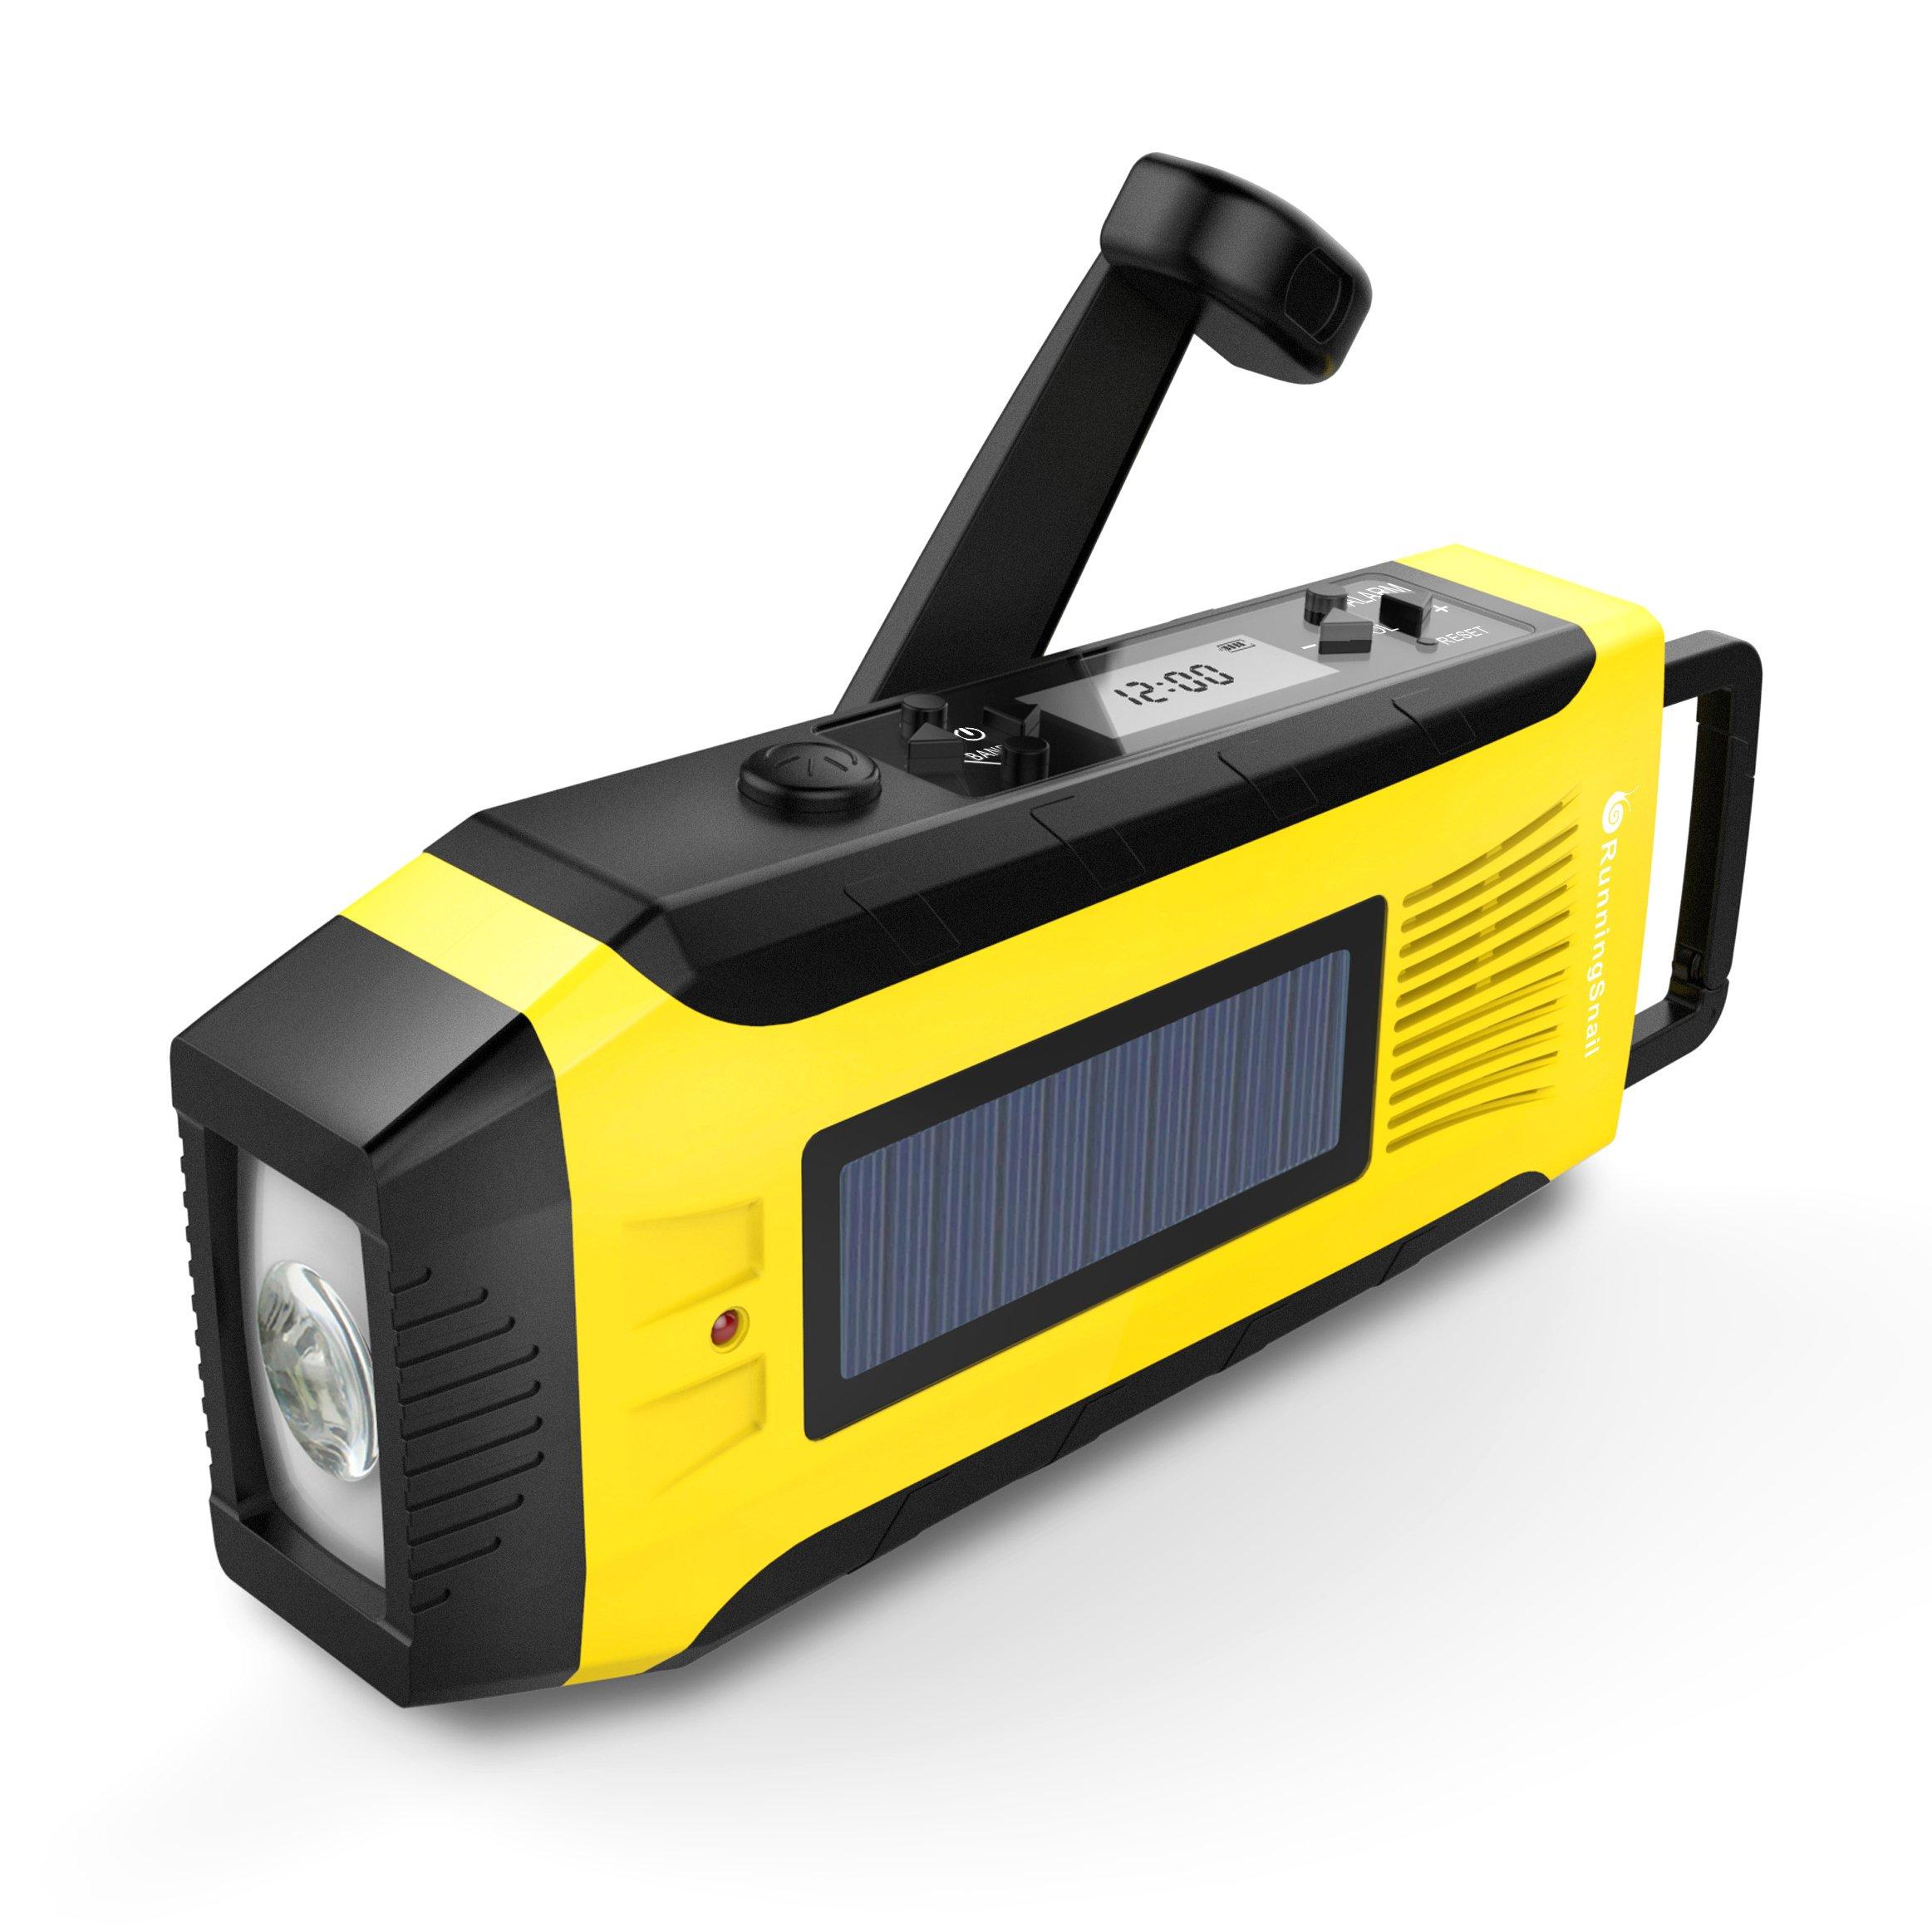 RunningSnail AM/FM NOAA Weather Emergency Solar Digital Crank Radio with 3W LED Flashlight, SOS Alarm & 2000MAh Power Bank(Yellow) … by RunningSnail (Image #1)